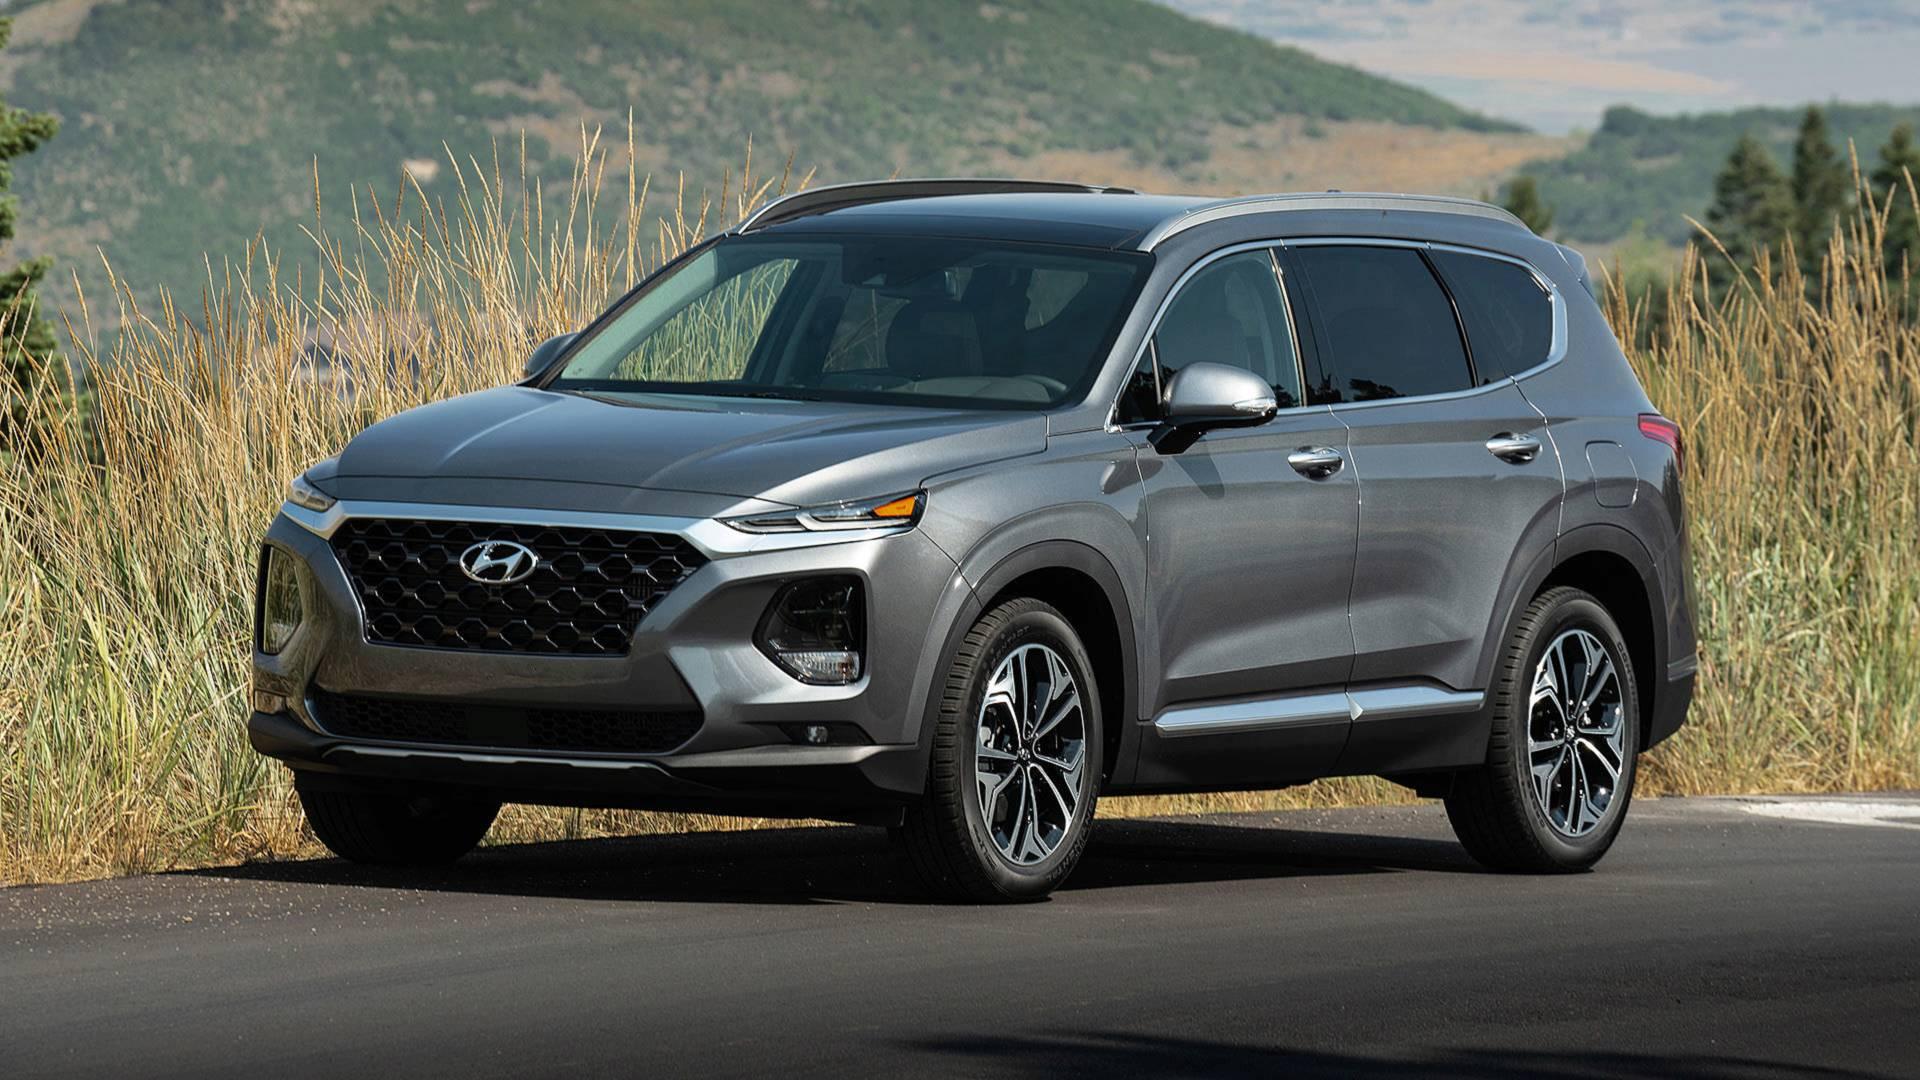 Picture of Nicholas' 2019 Hyundai Sante Fe